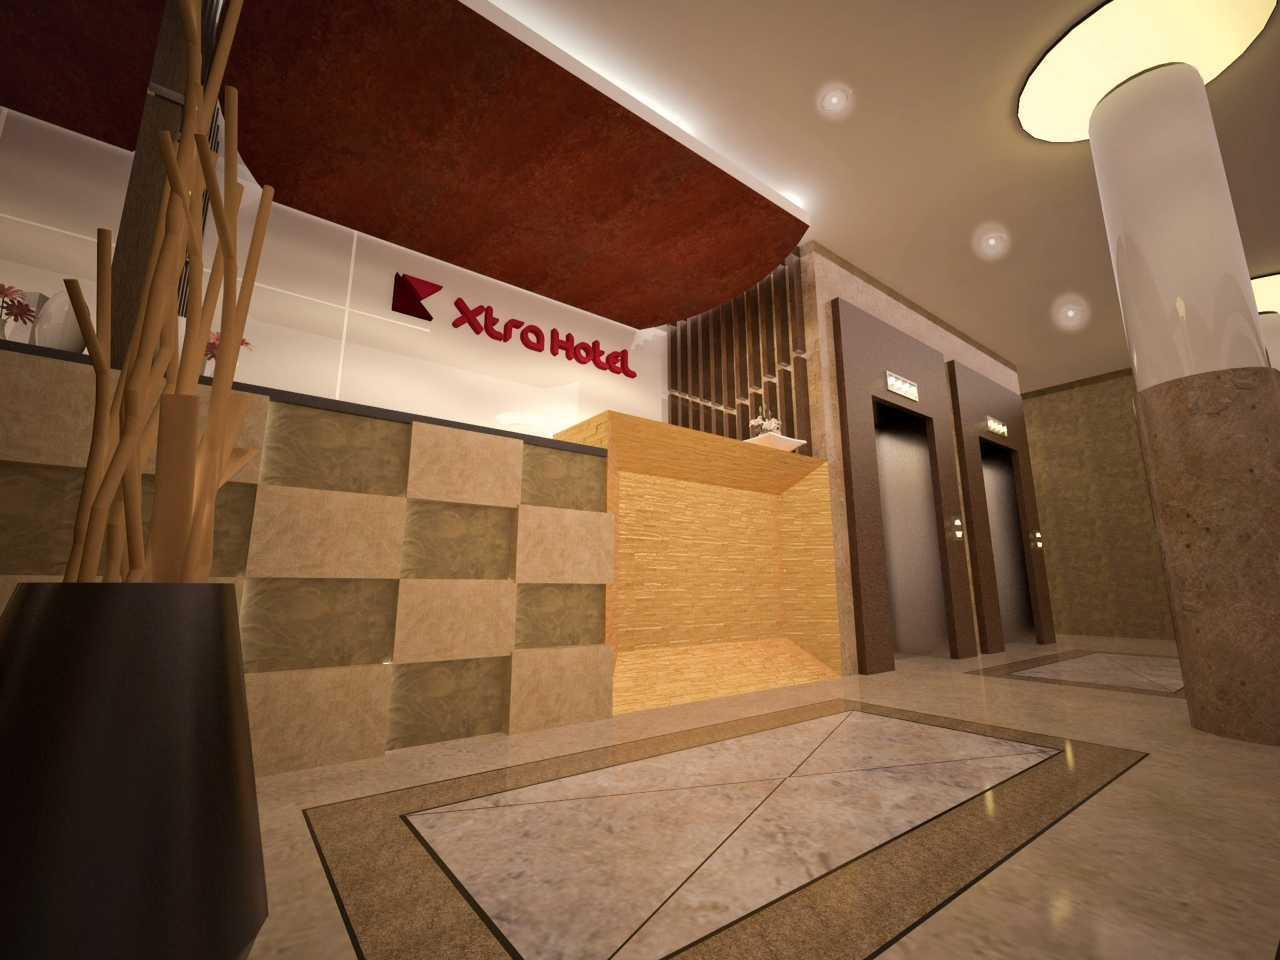 Archdesignbuild7 Pengembangan Hotel Xtra   Jl. Mayjen Sutoyo No.31, Tanah Patah, Ratu Agung, Kota Bengkulu, Bengkulu   Jl. Mayjen Sutoyo No.31, Tanah Patah, Ratu Agung, Kota Bengkulu, Bengkulu  Lift Lobby Modern 19046